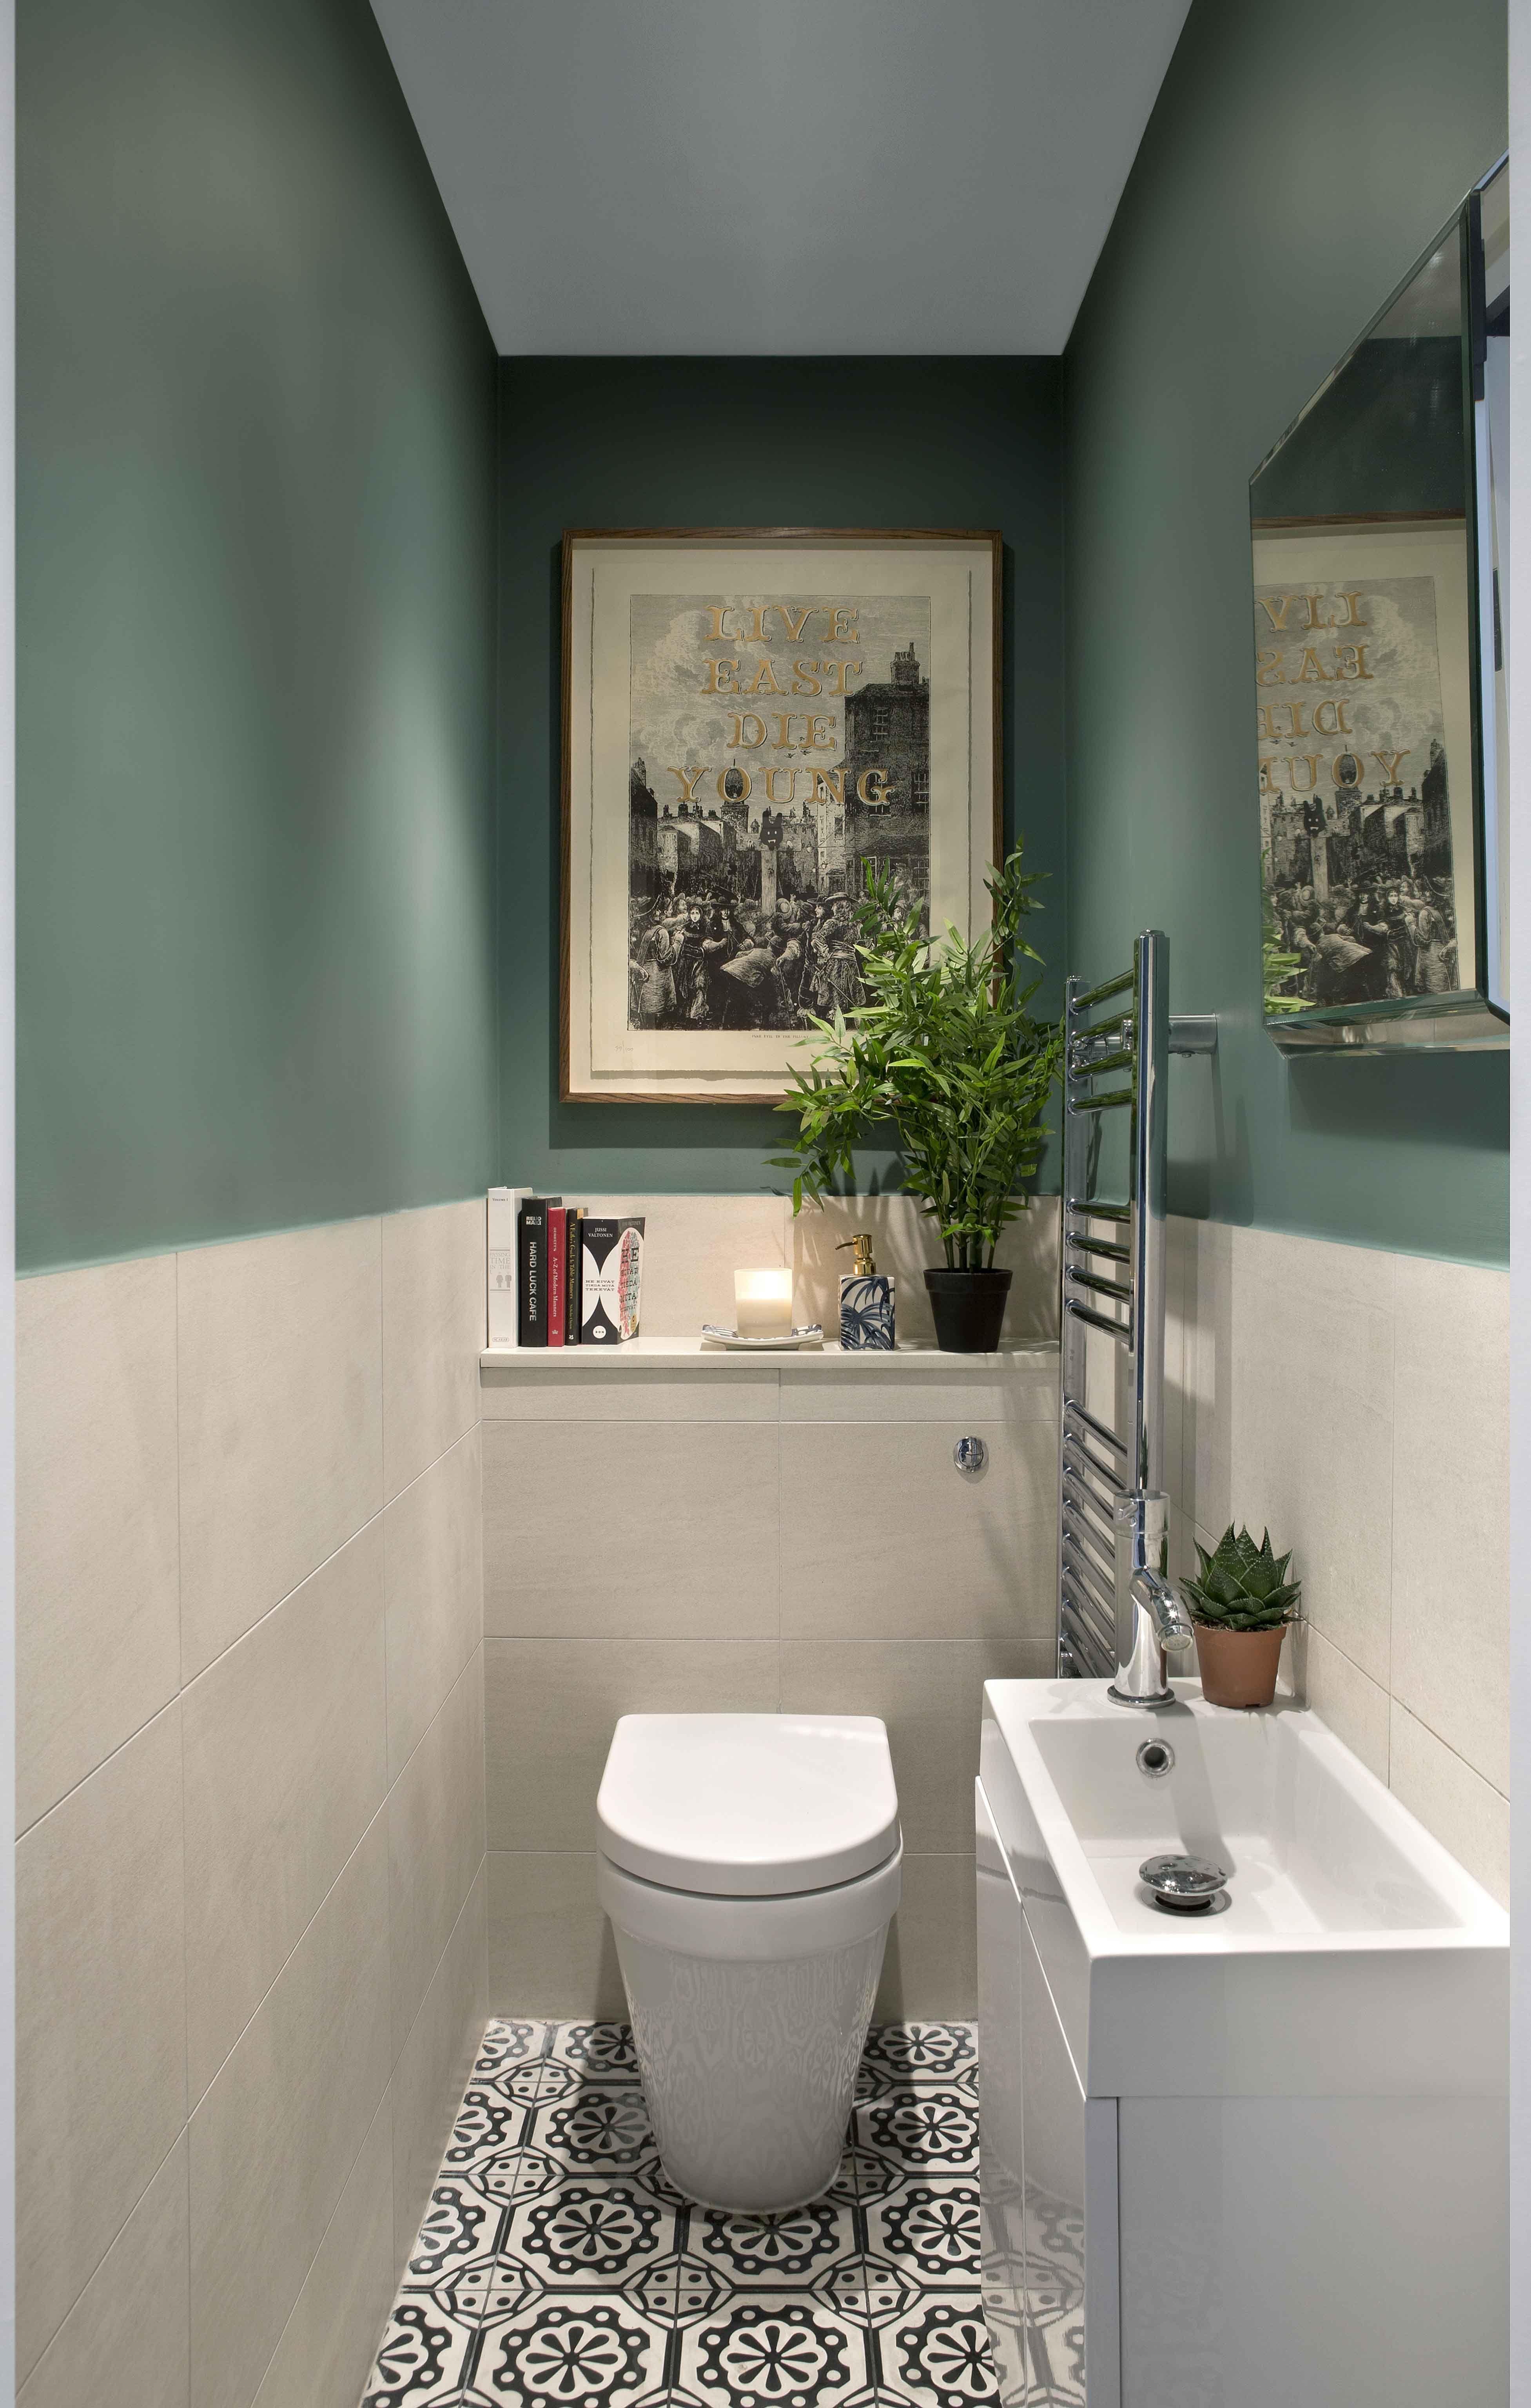 Green And Patterned Tile Bathroom By Kingstonlaffertydesign Com Small Bathroom Makeover Serene Bathroom Small Bathroom Remodel